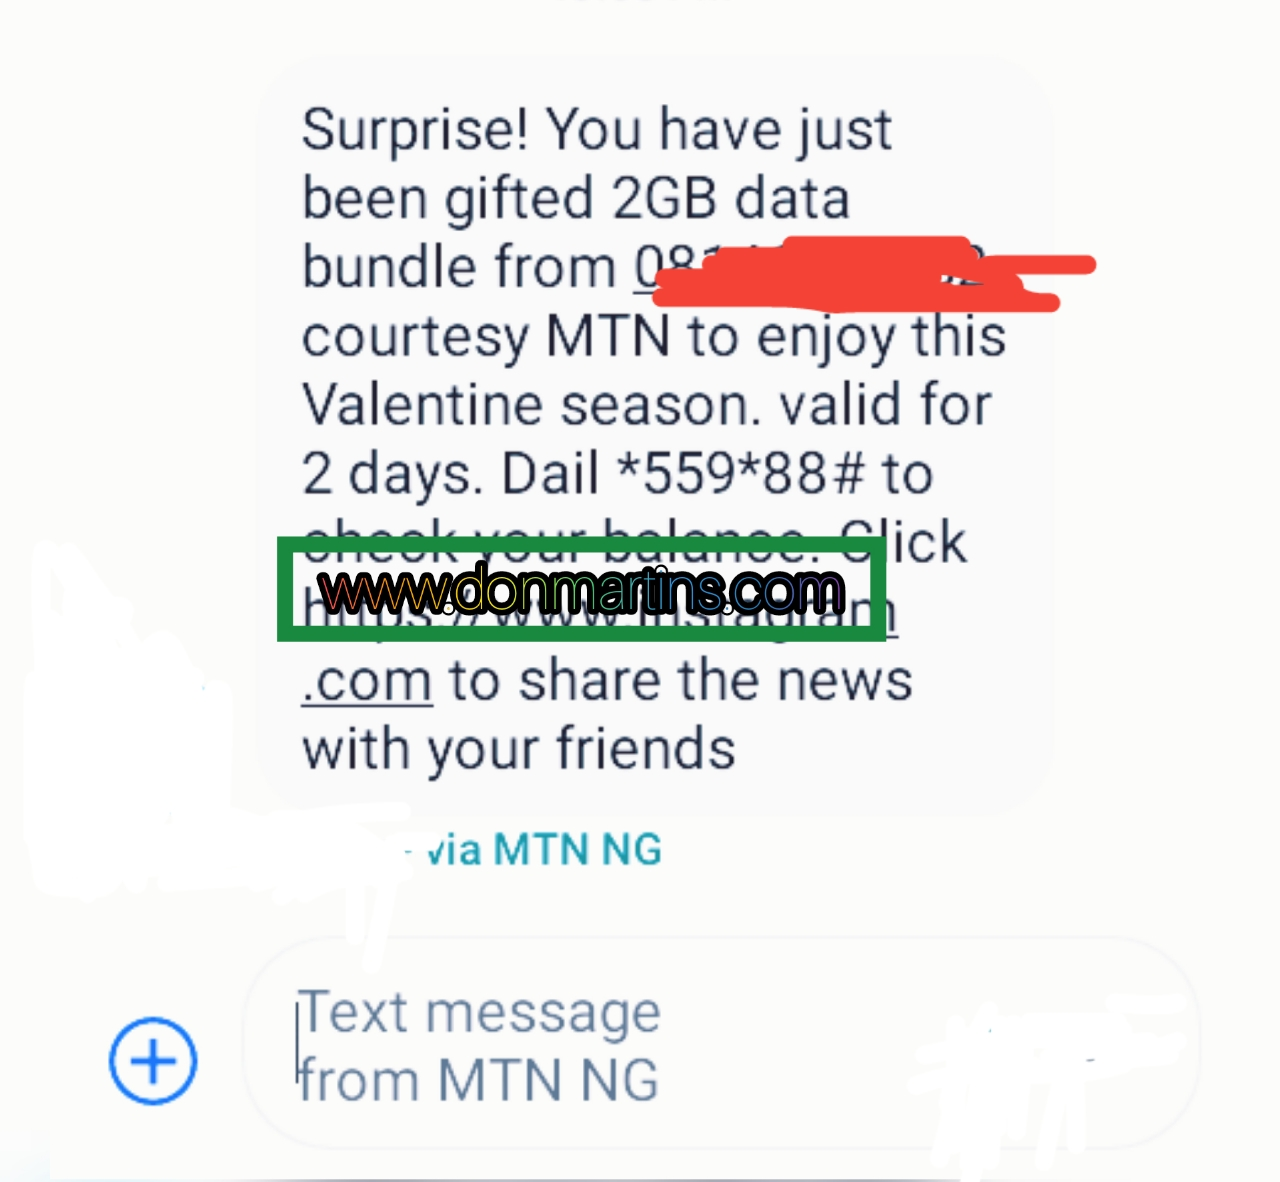 alert from my mtn app